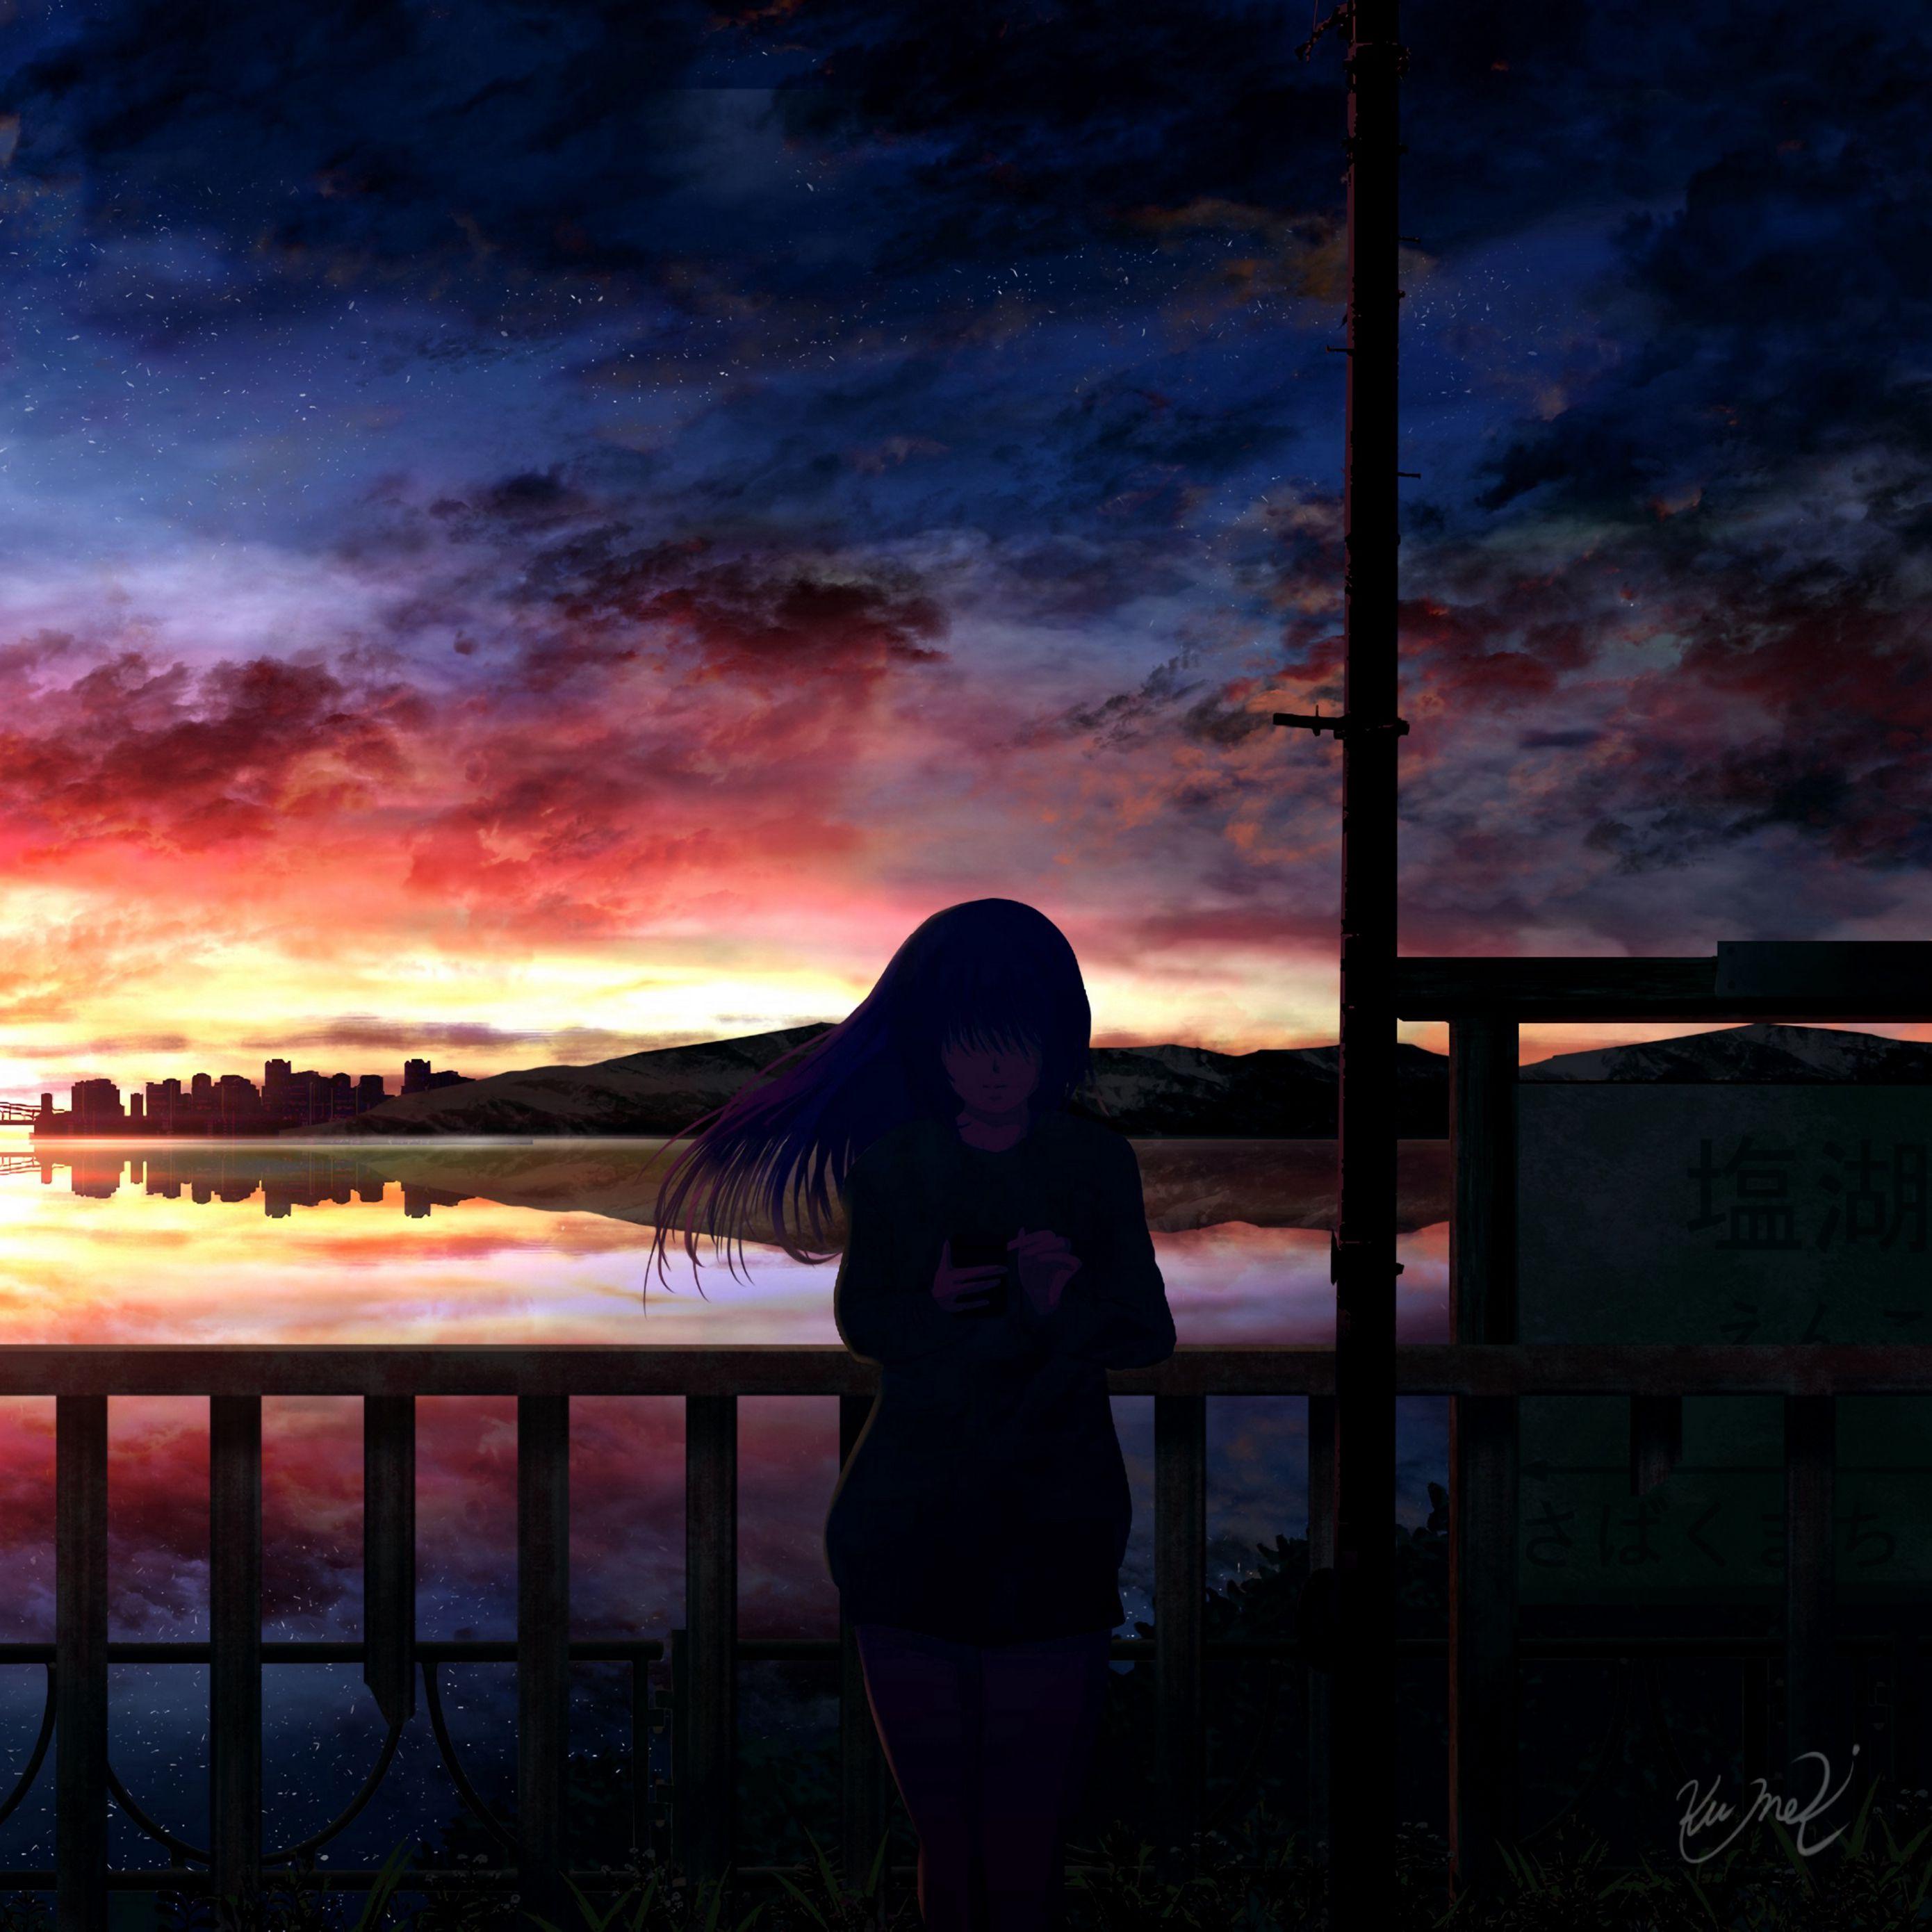 2780x2780 Wallpaper silhouette, night, starry sky, girl, anime